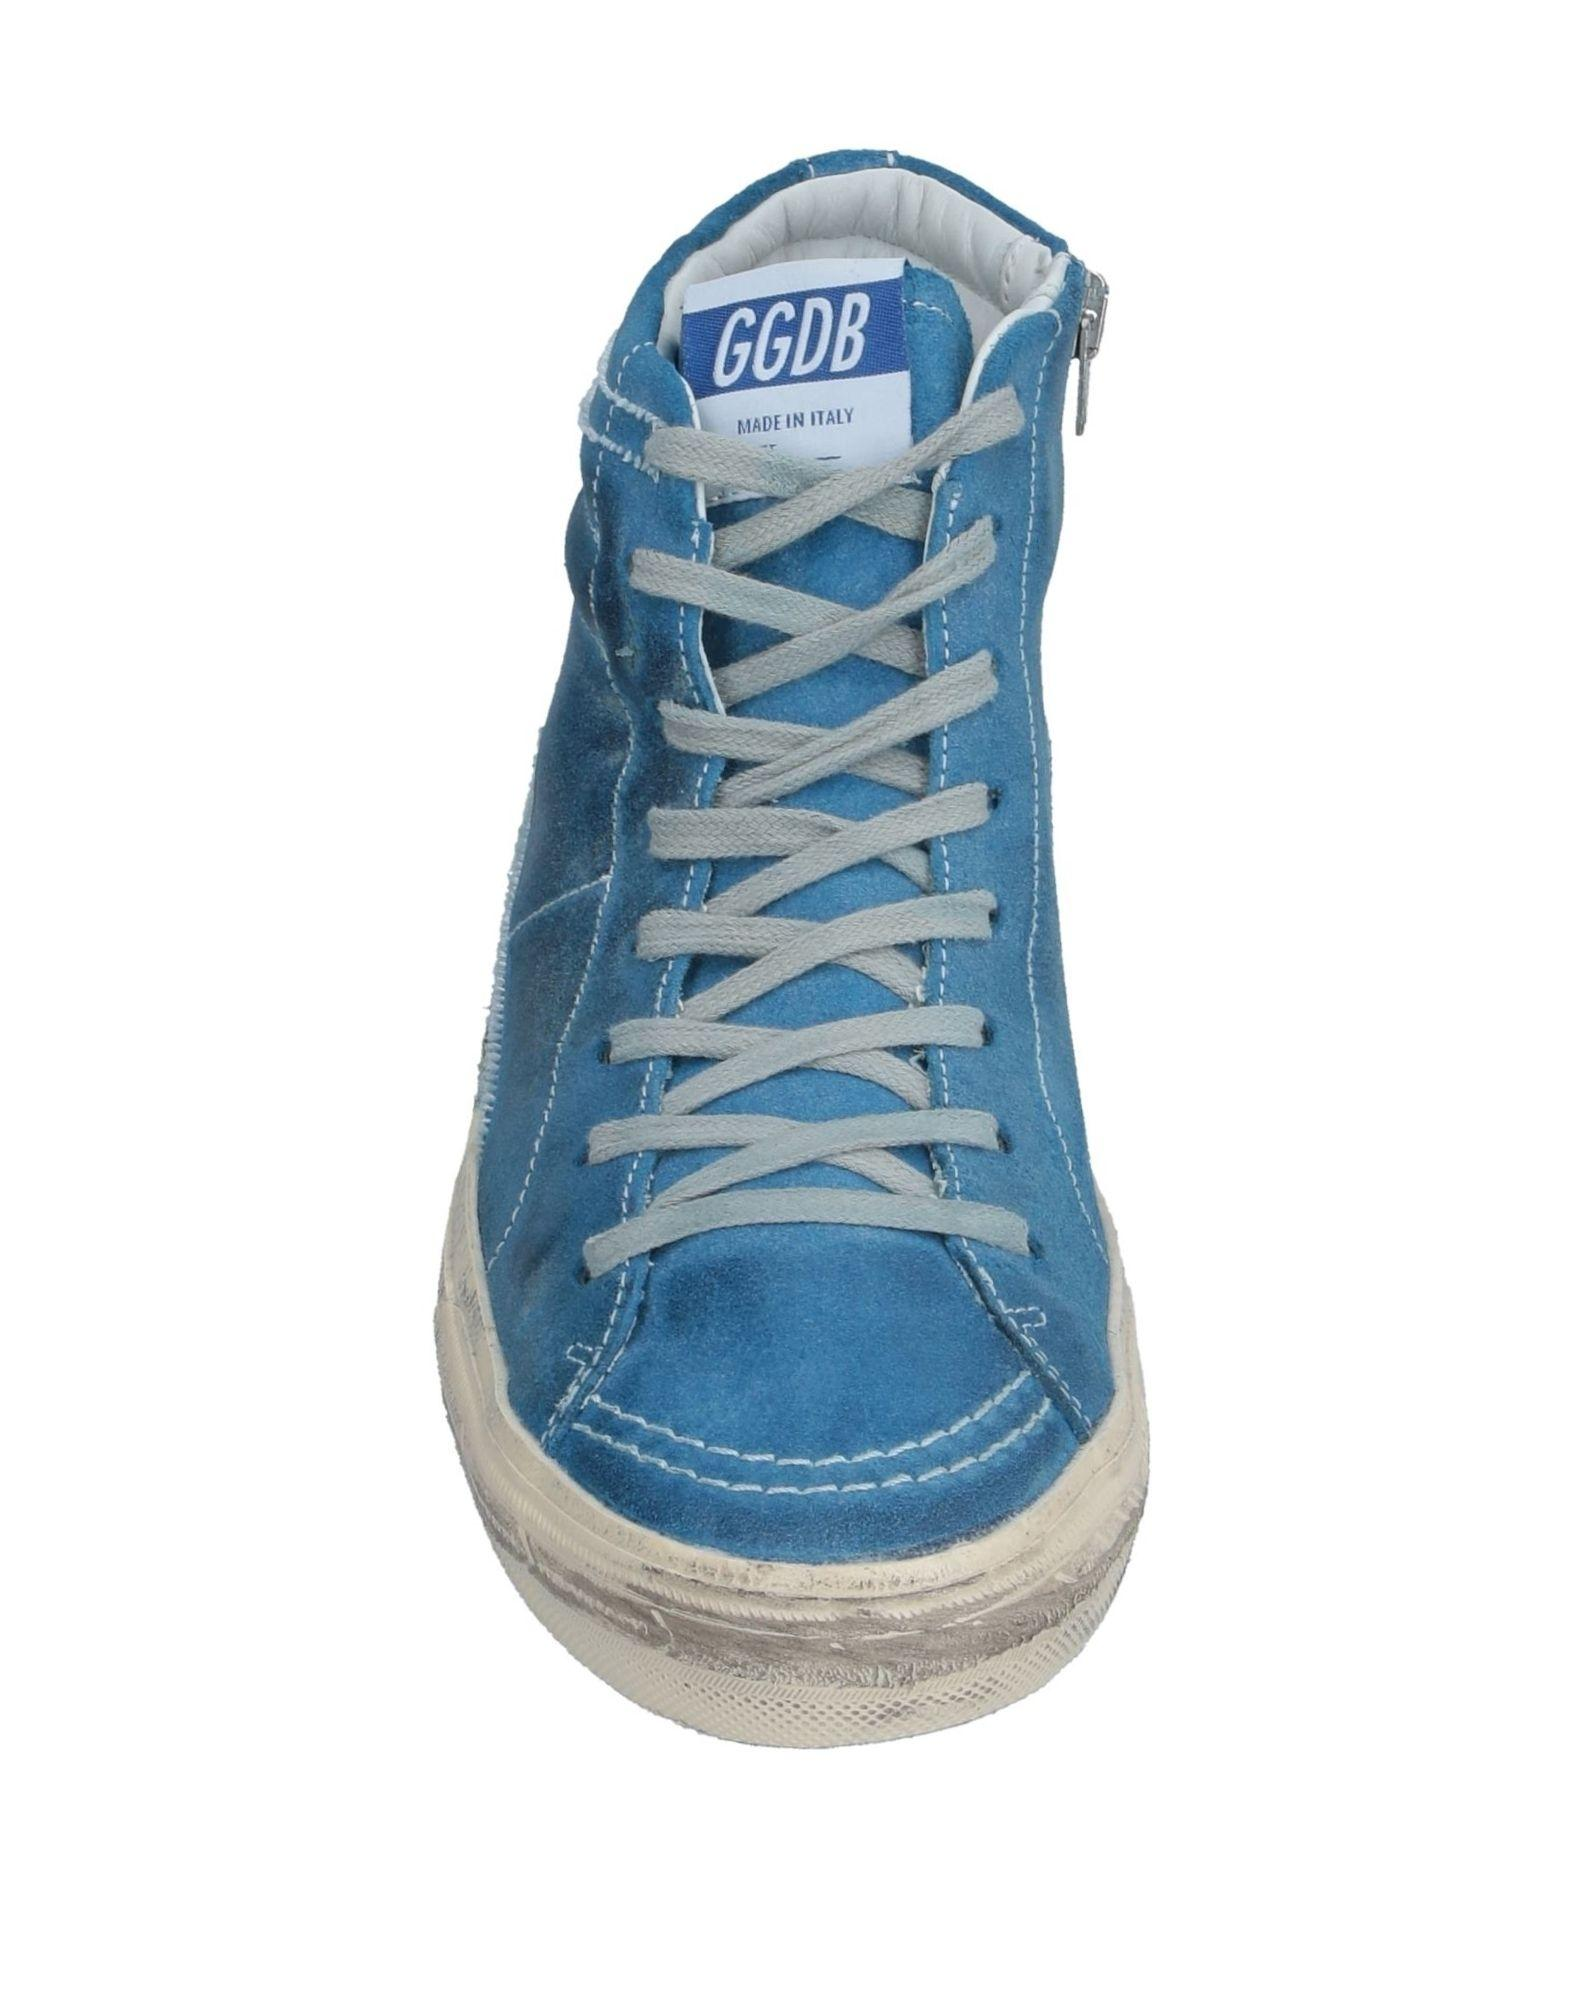 Sneakers abotinadas Golden Goose Deluxe Brand de Cuero de color Azul para hombre